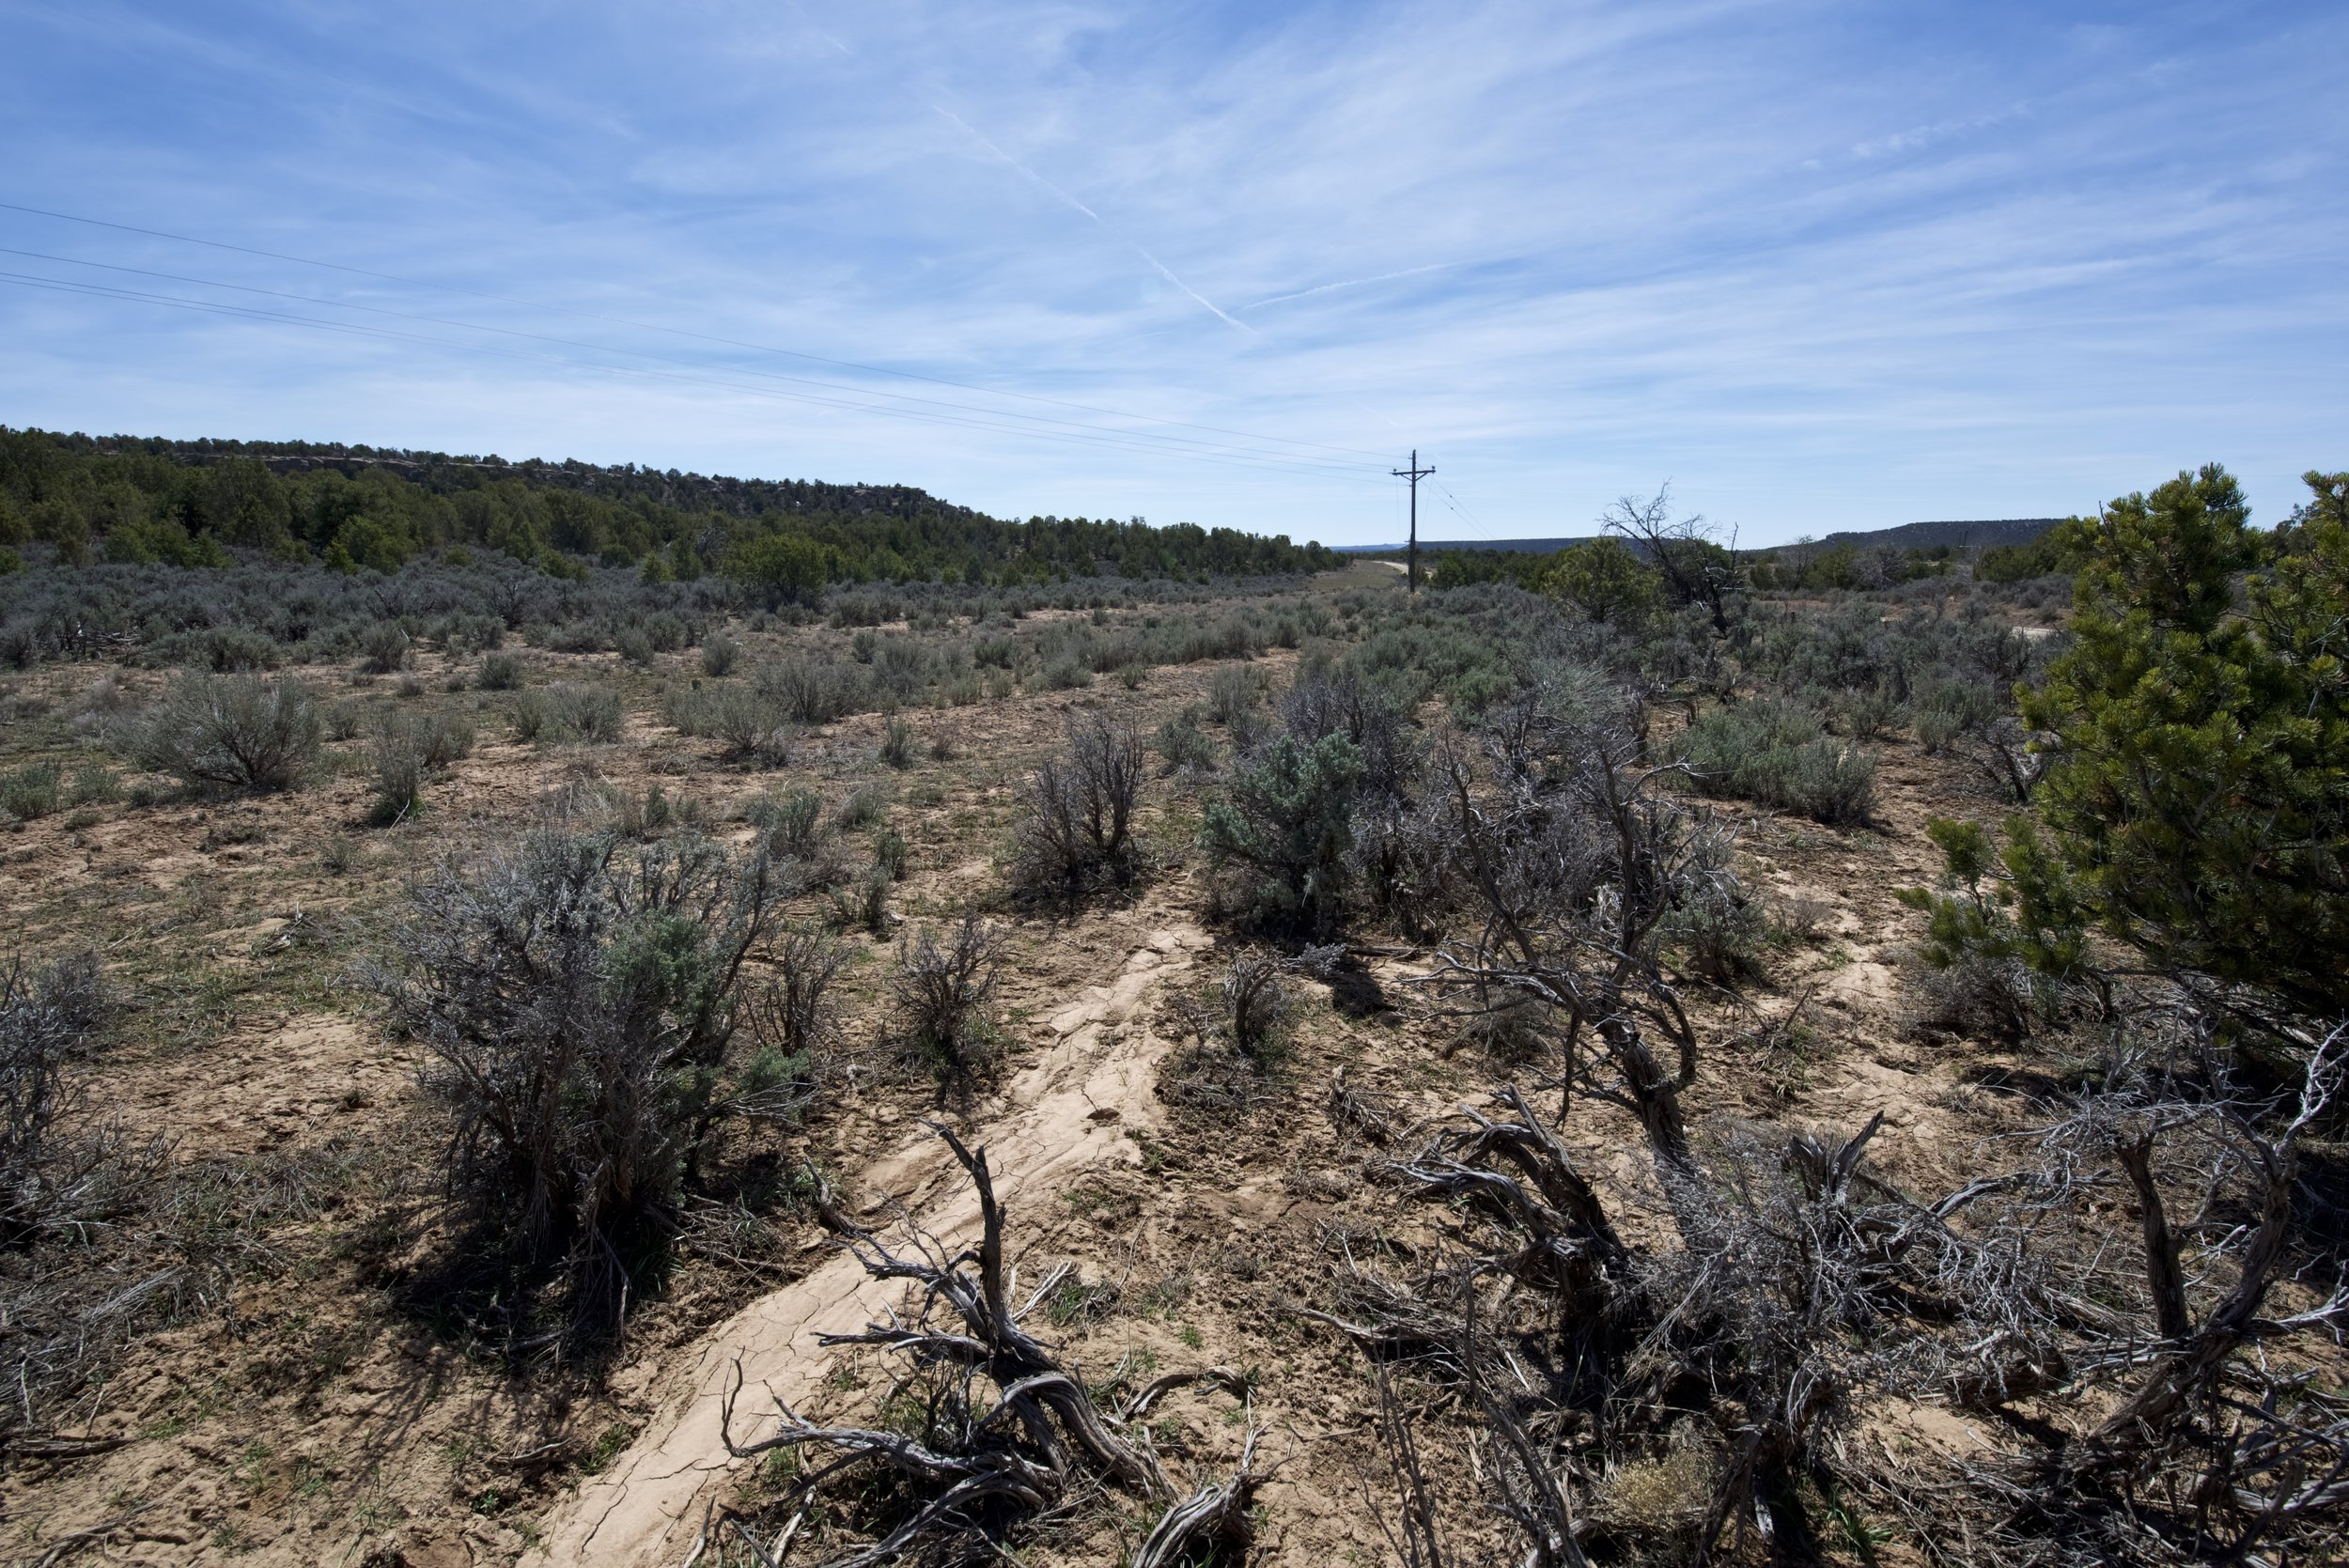 SJNM-3561-navajo-dam-123544.jpg